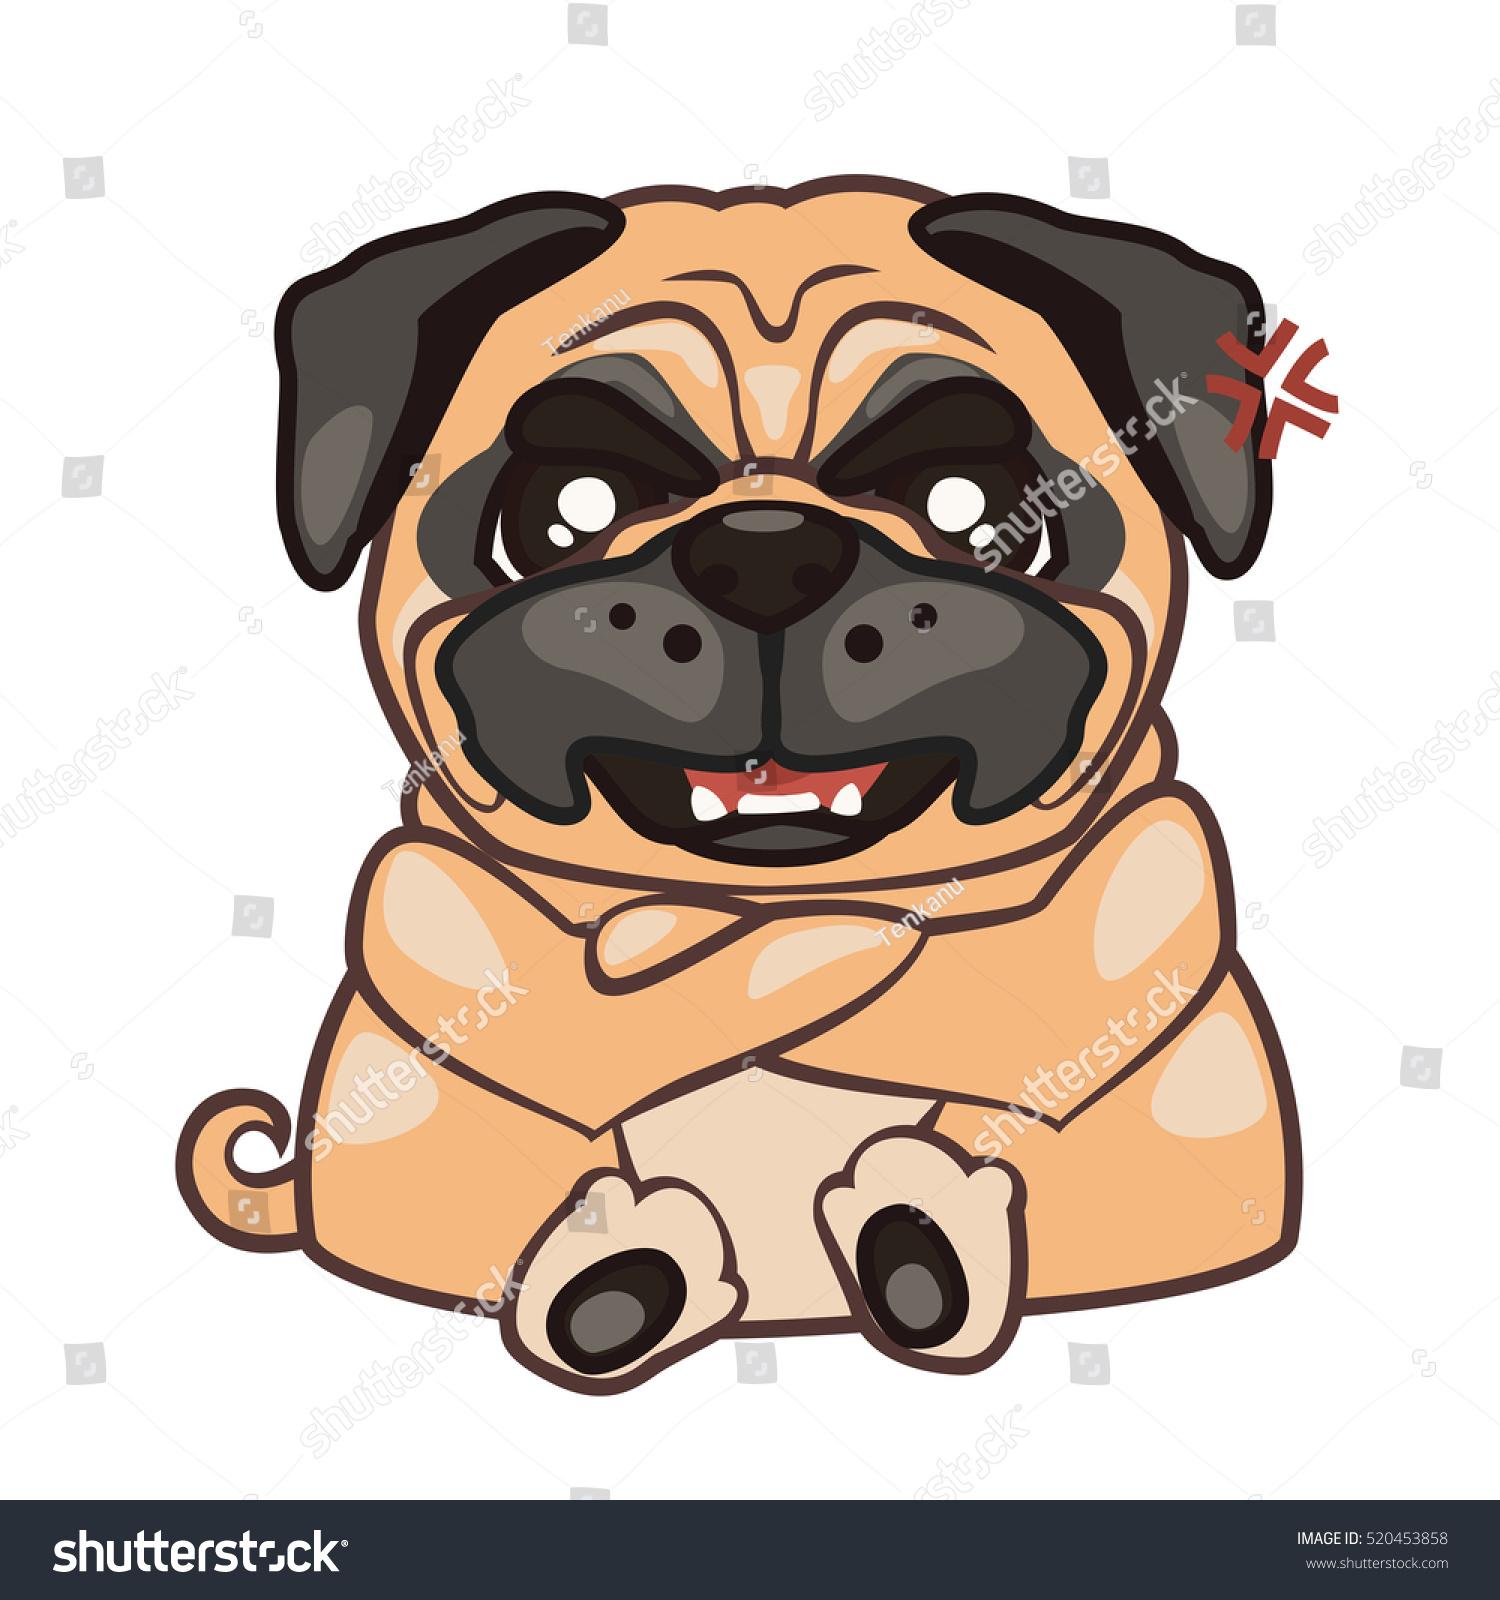 Dog Sitting Angry Sticker Pug Vector Vector de stock520453858 ...